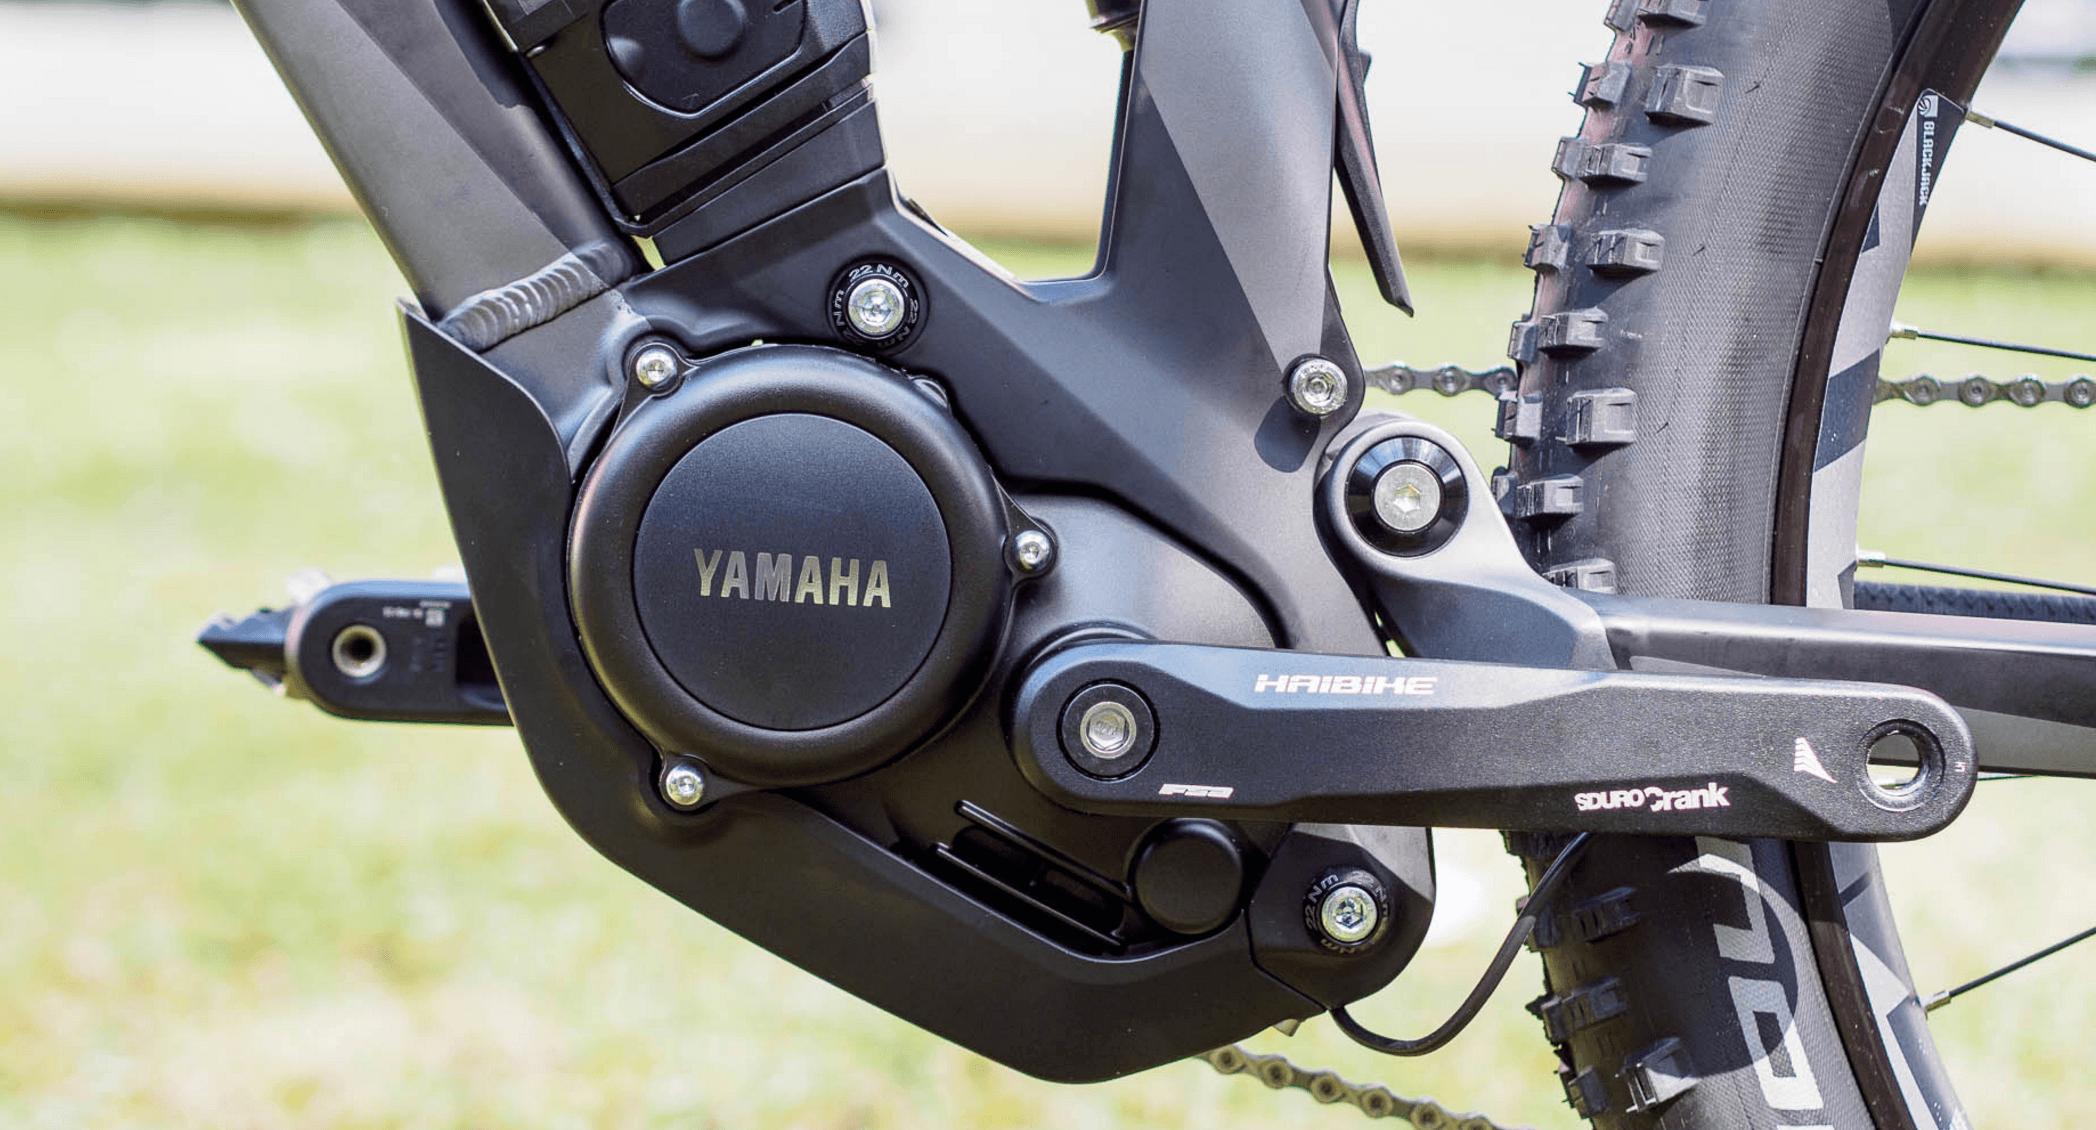 El Mejor Motor E Bike 2020 Yamaha Bosch Brose O Shimano